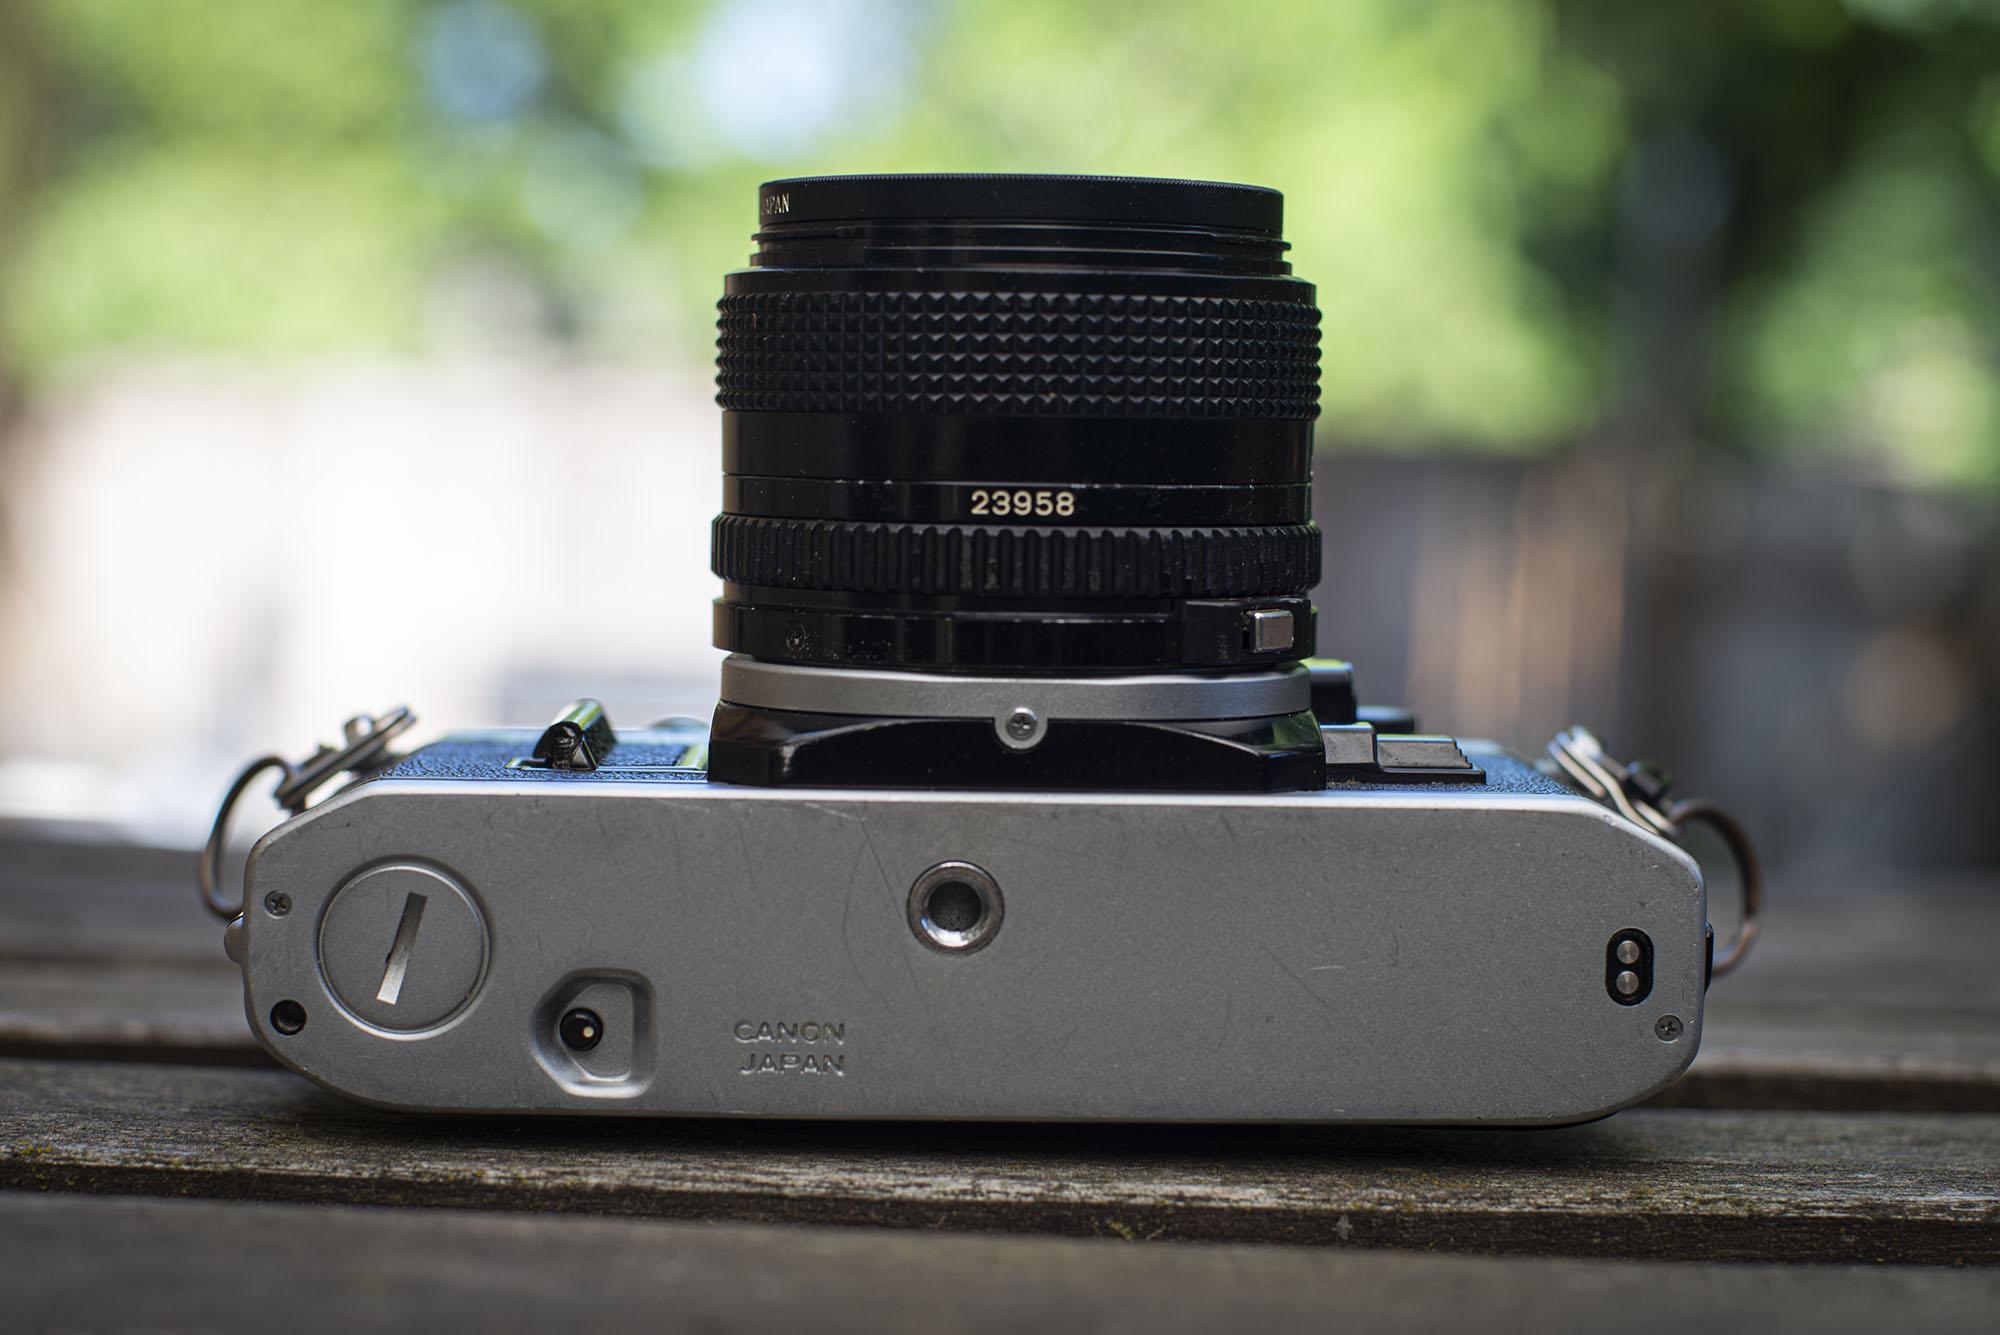 bottom of the camera